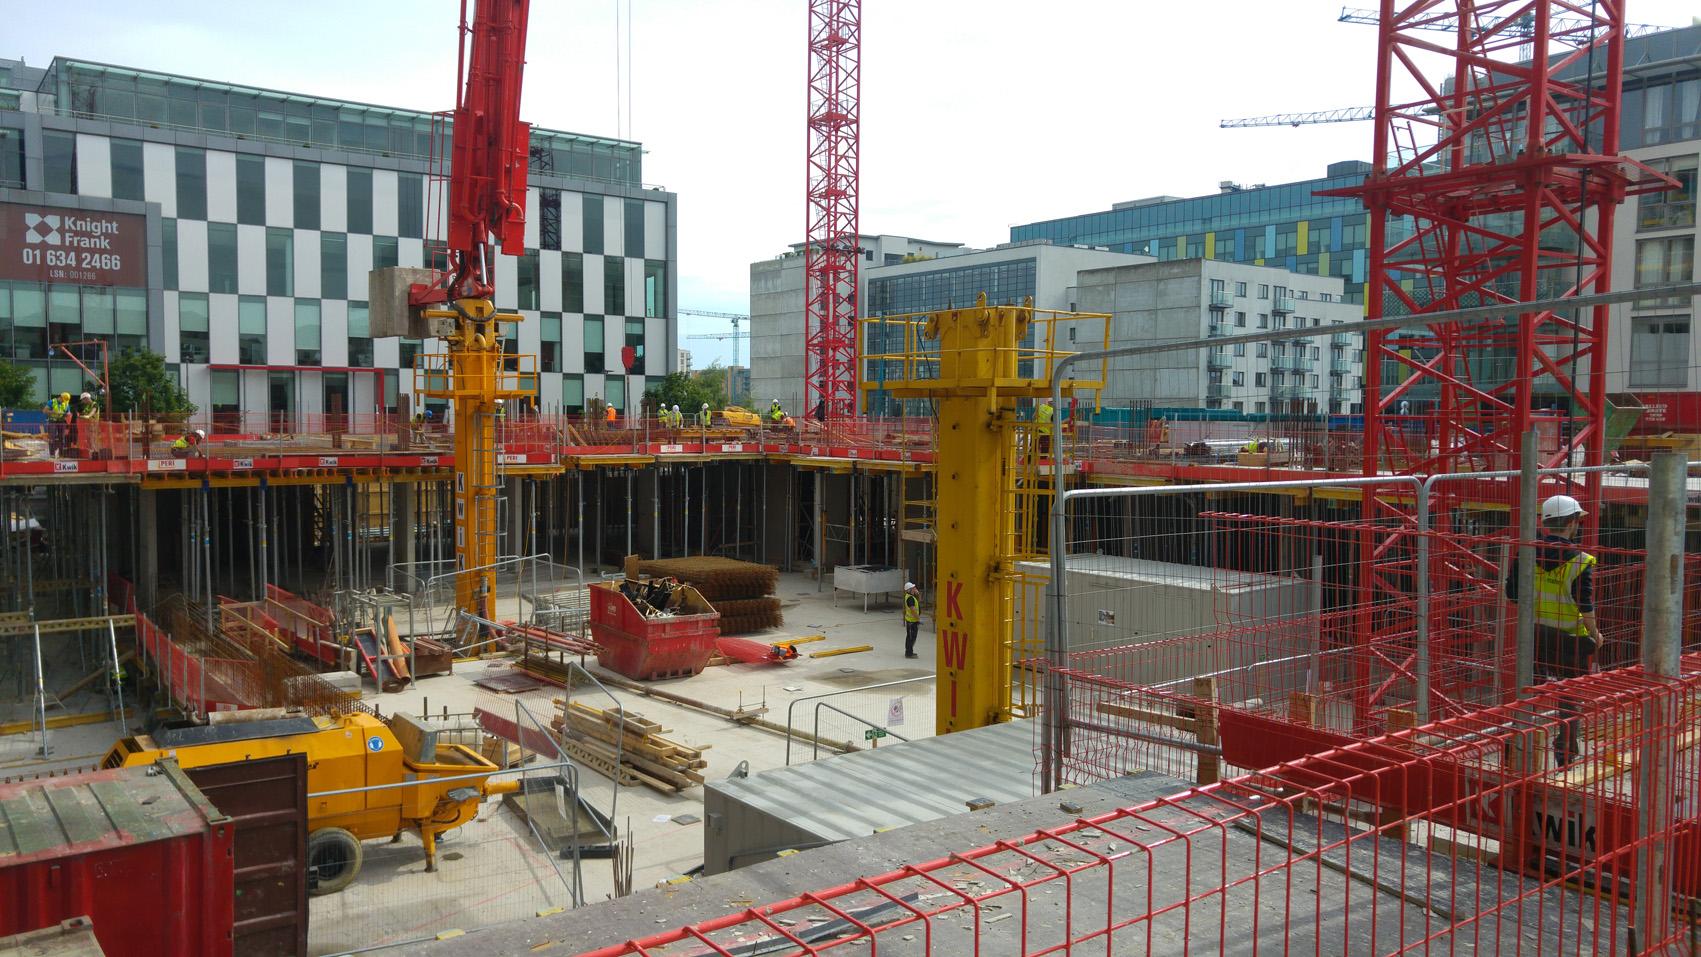 Latest News - January 2017 - Work begins on site